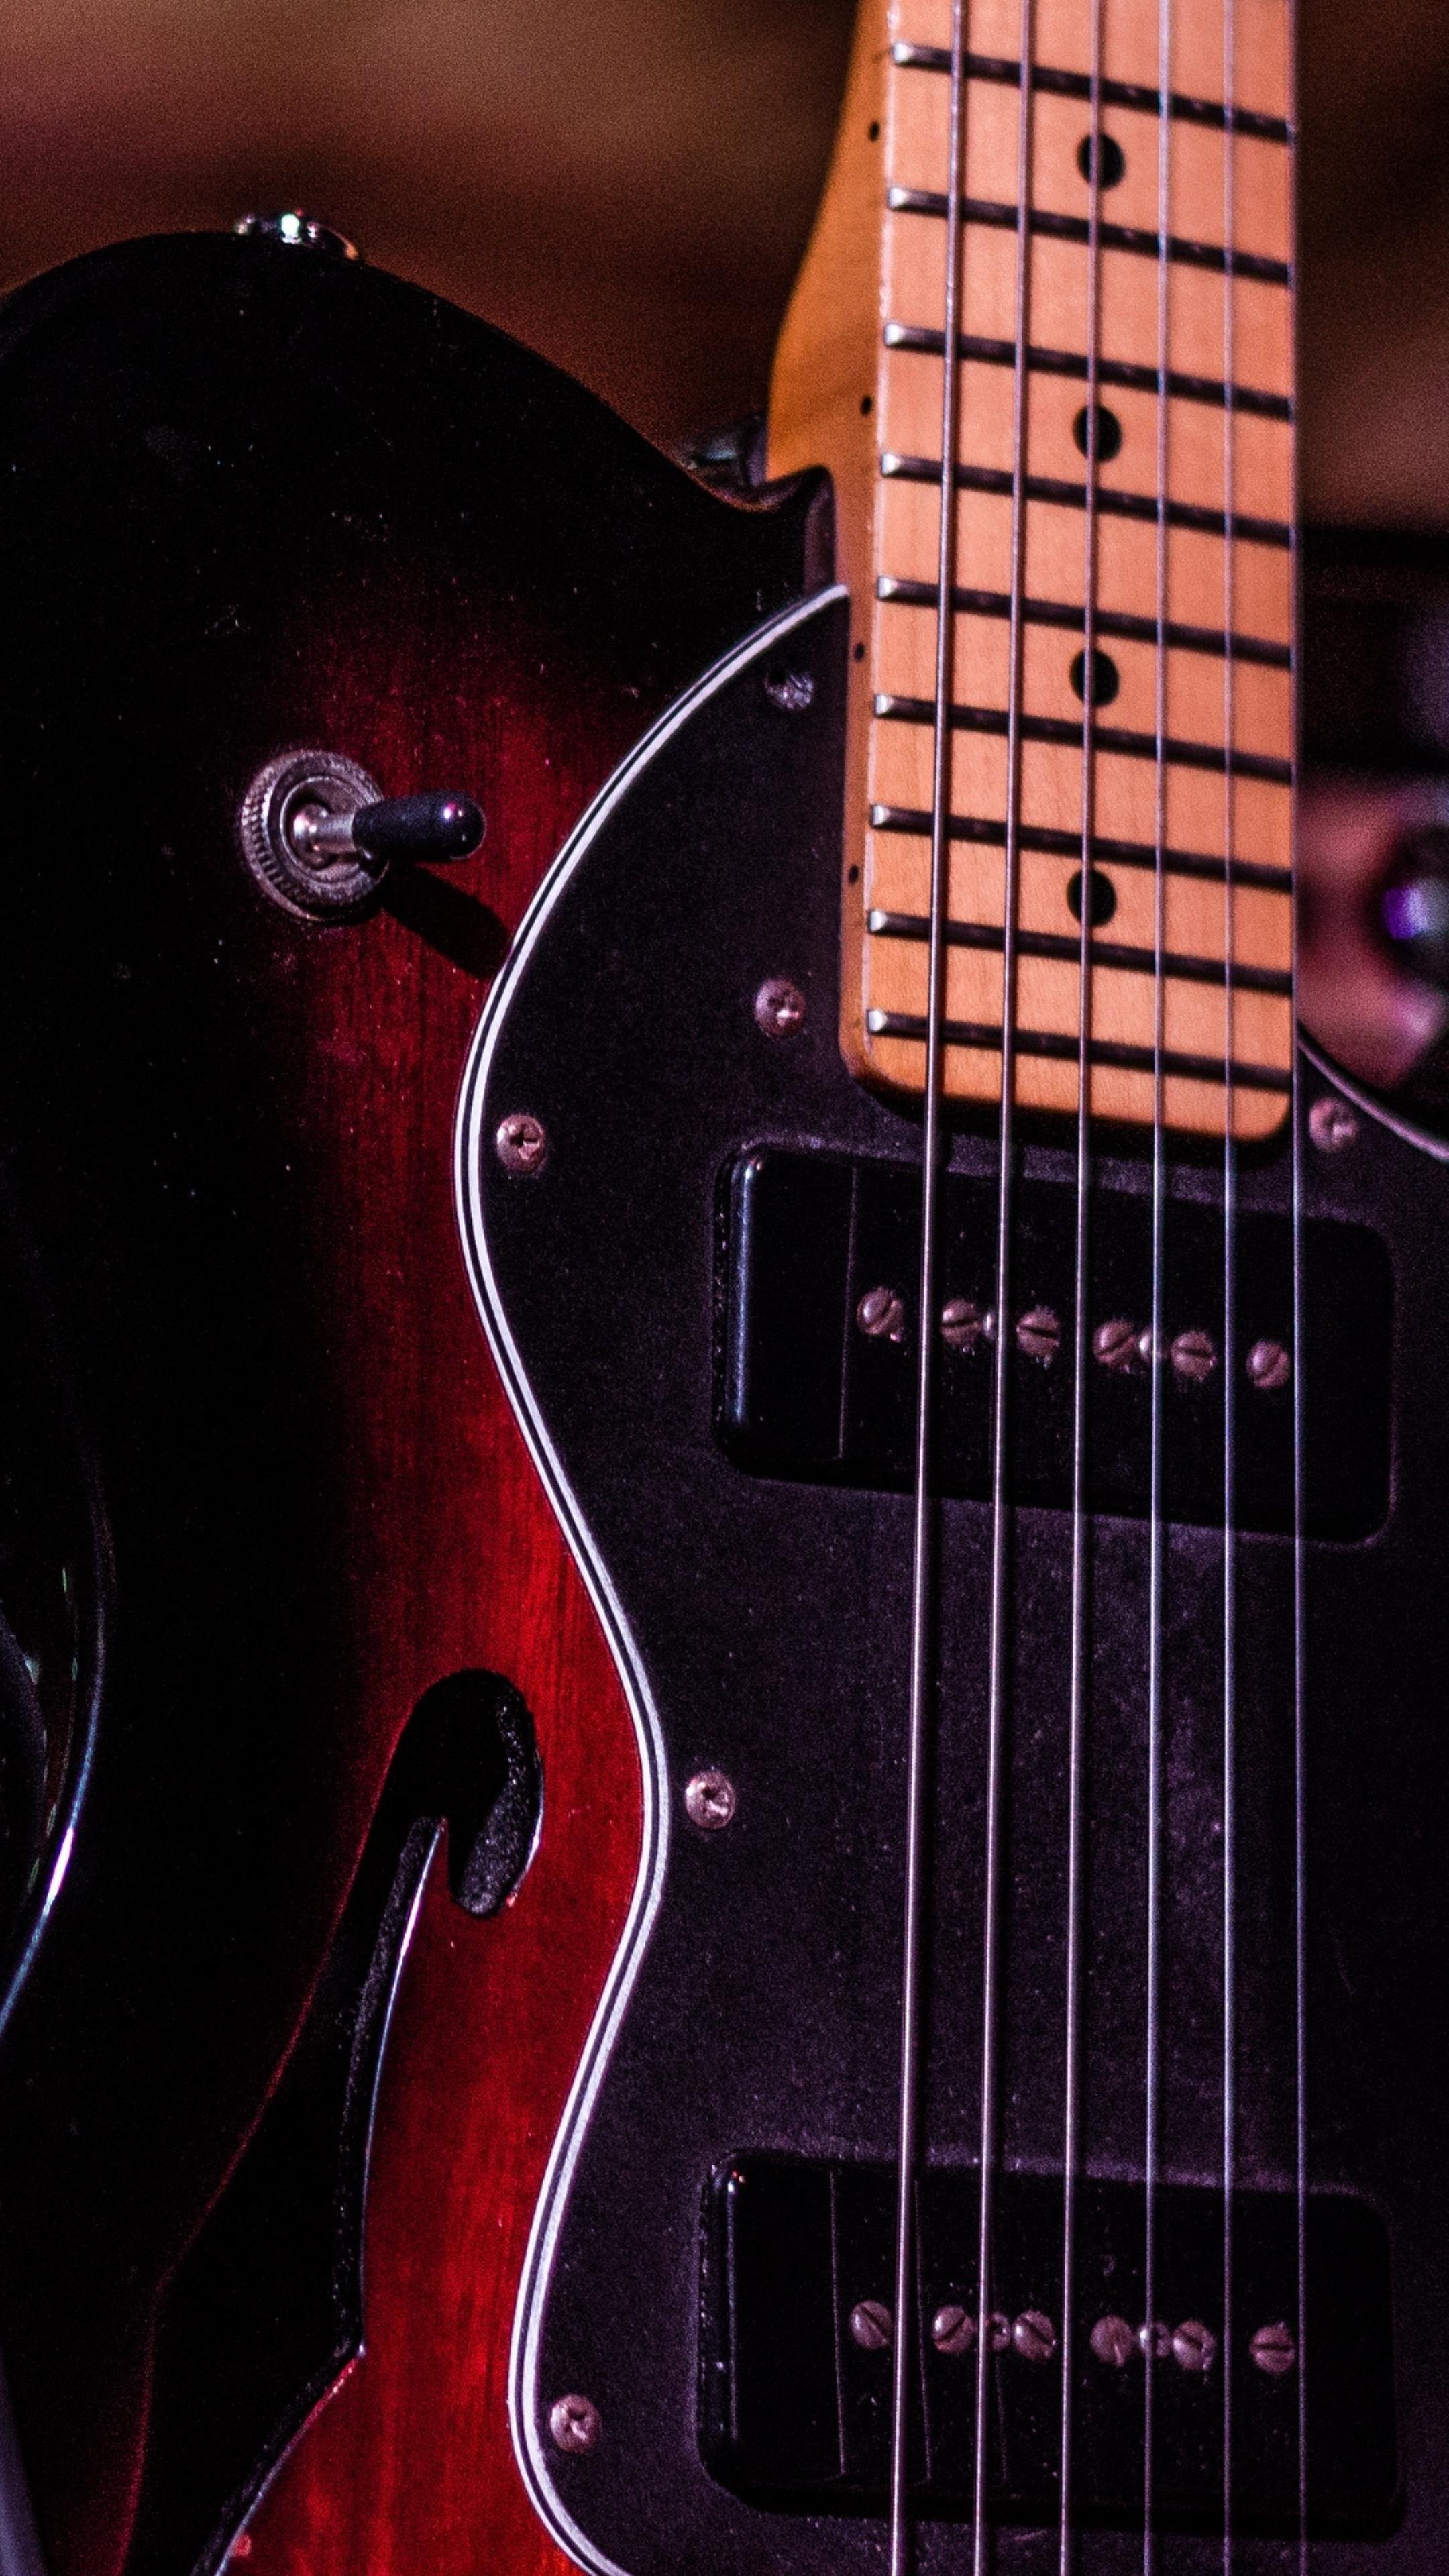 Music Instrument Electric Guitar 4k Wallpaper